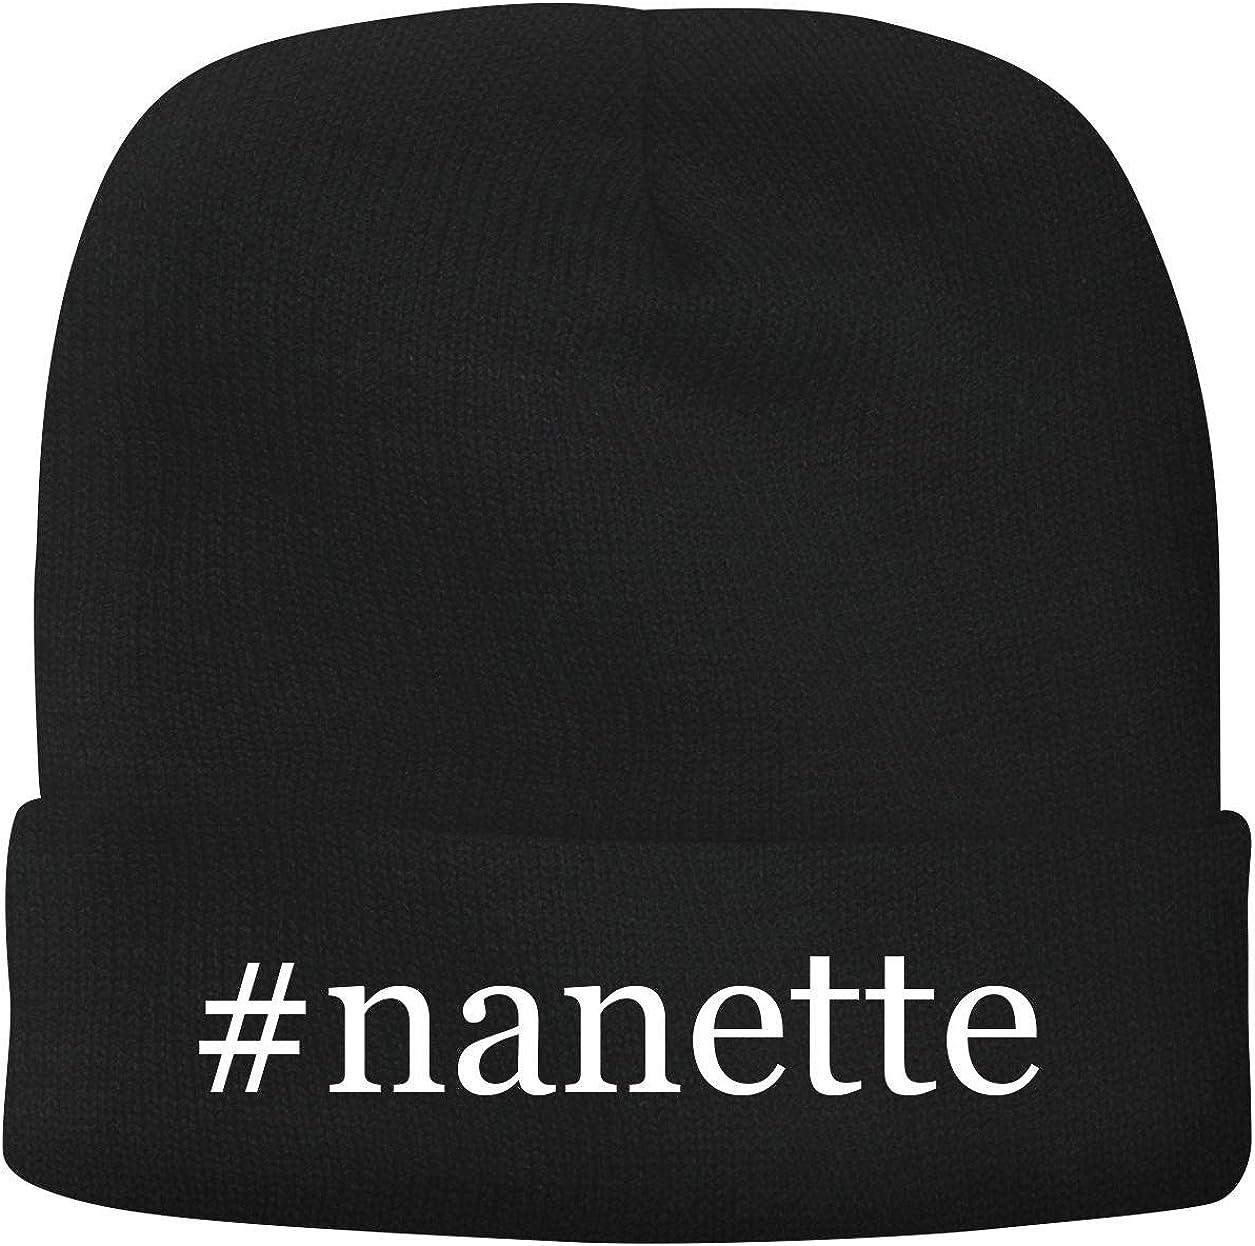 Max 74% OFF BH Cool Designs #Nanette - Soft Bean Hashtag Comfortable Oklahoma City Mall Men's